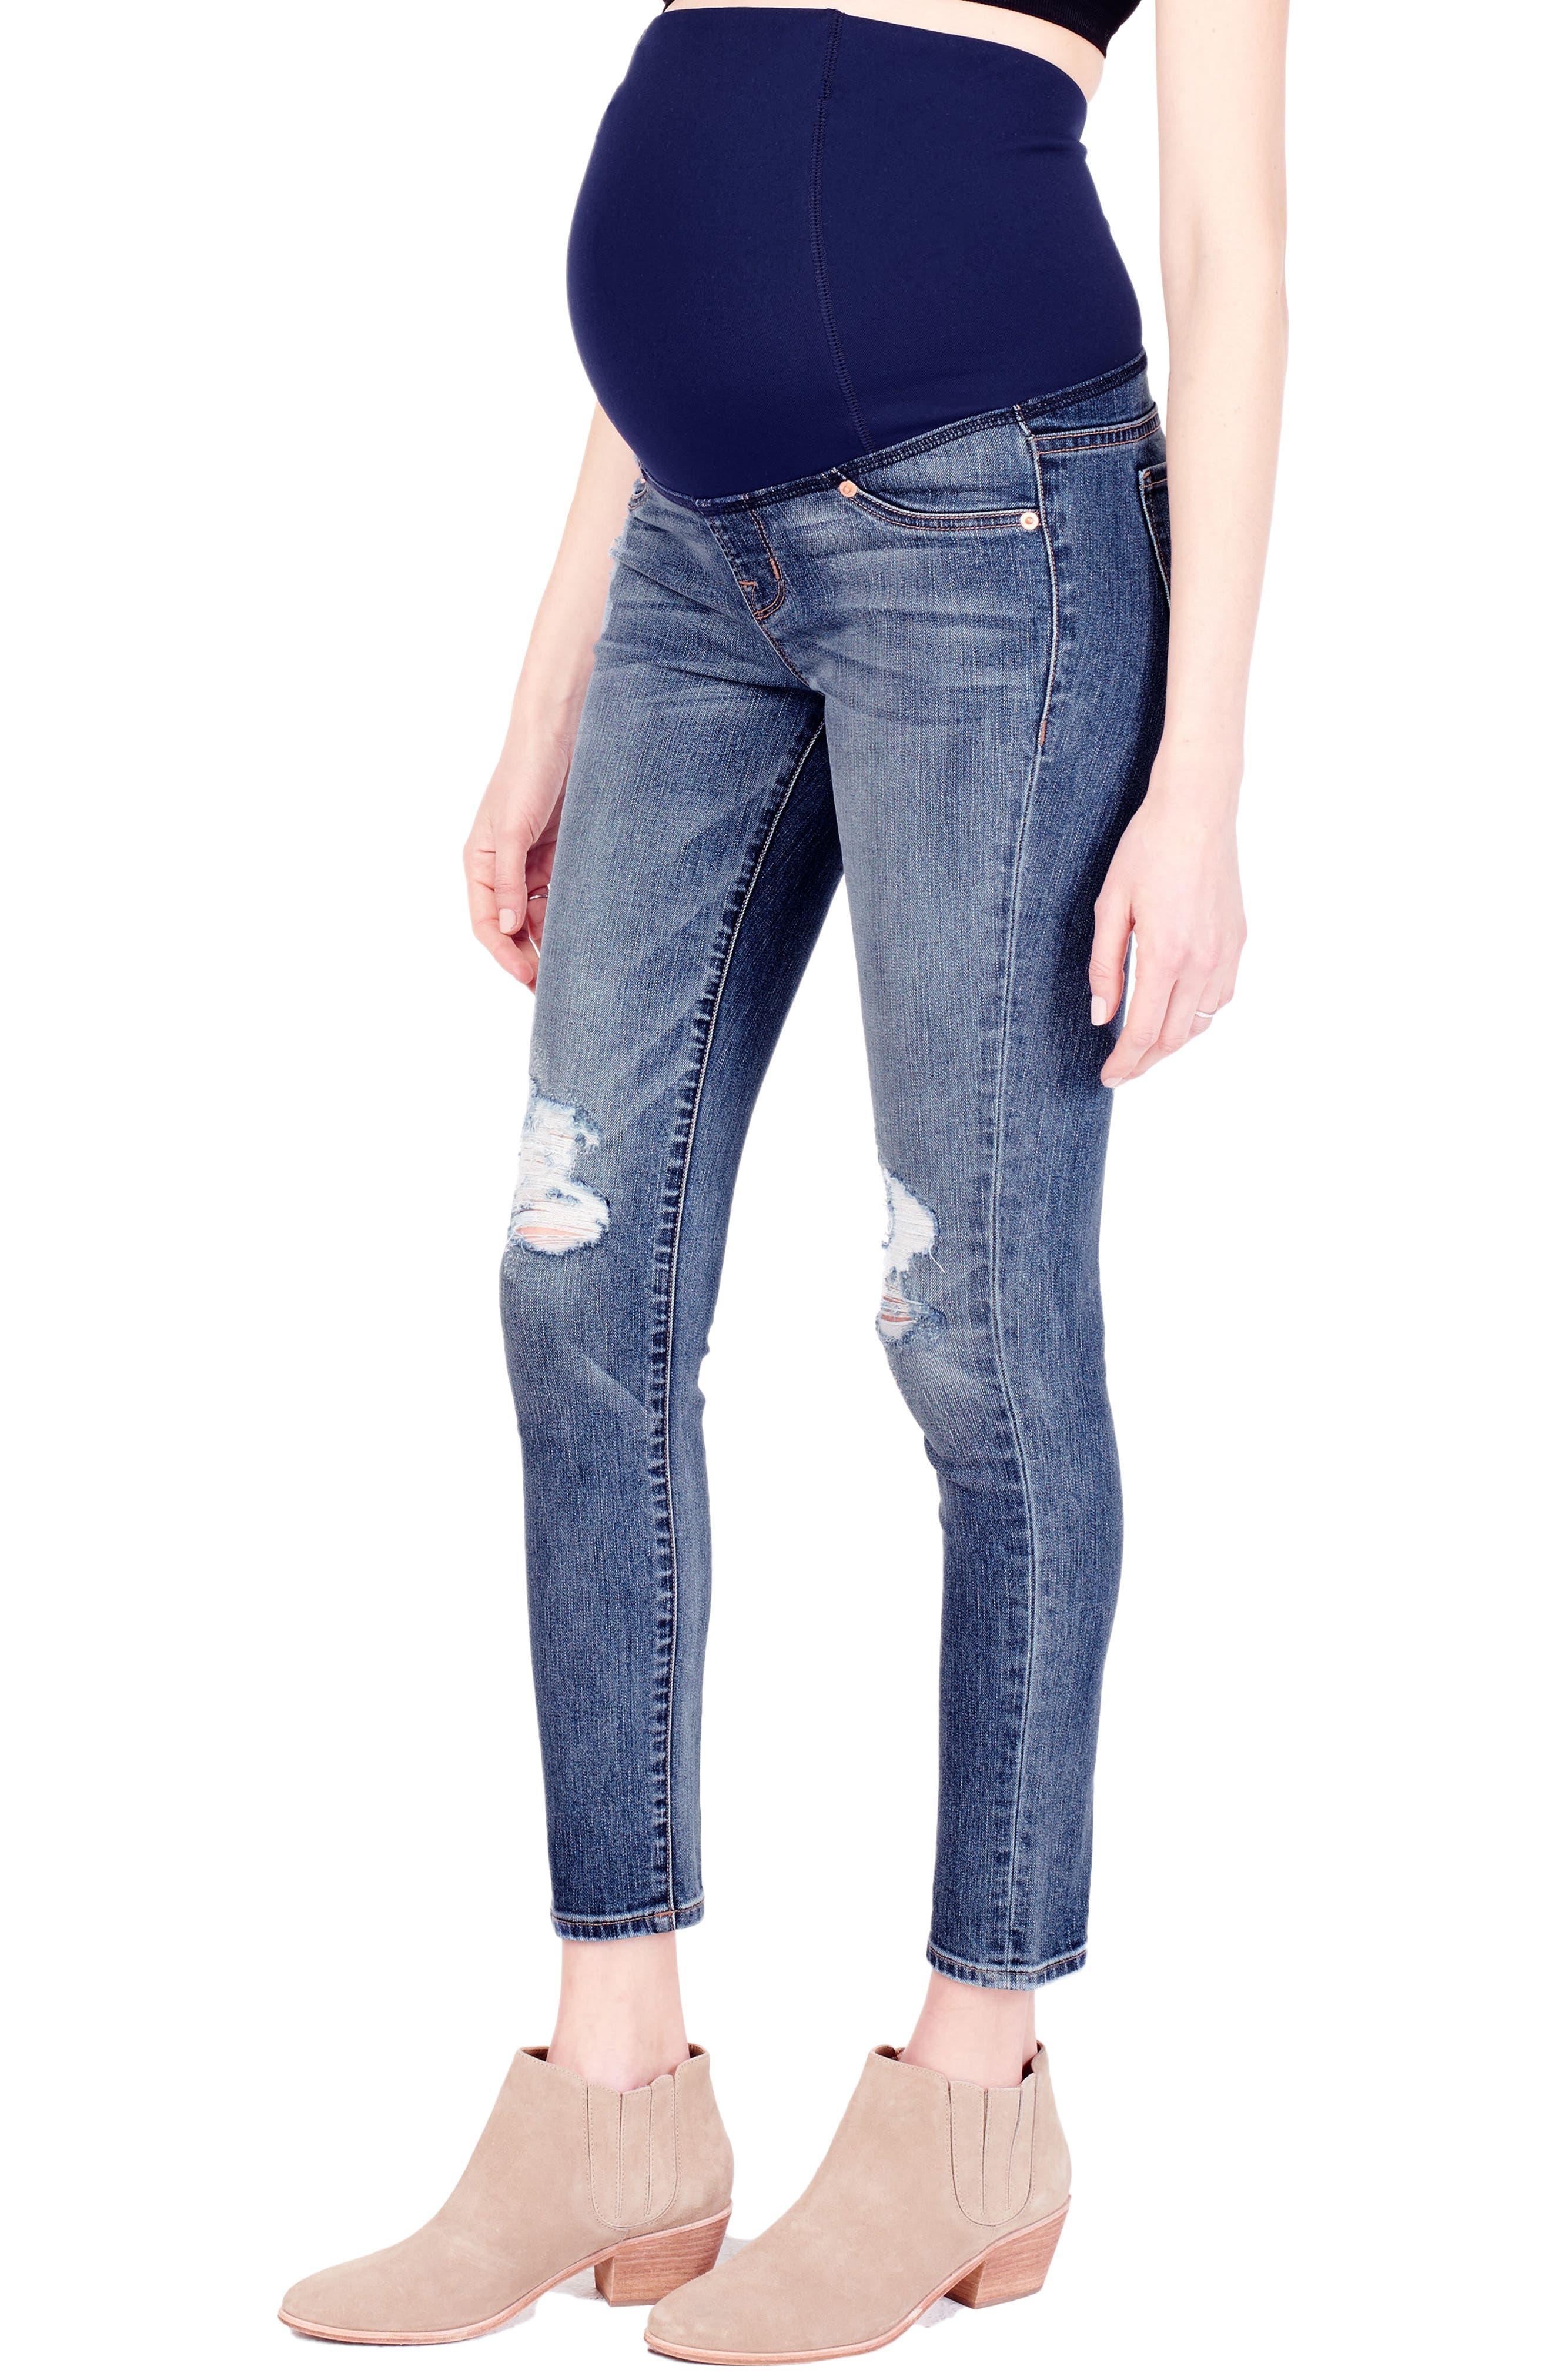 Alternate Image 3  - Ingrid & Isabel® Sasha Maternity Skinny Jeans with Crossover Panel™